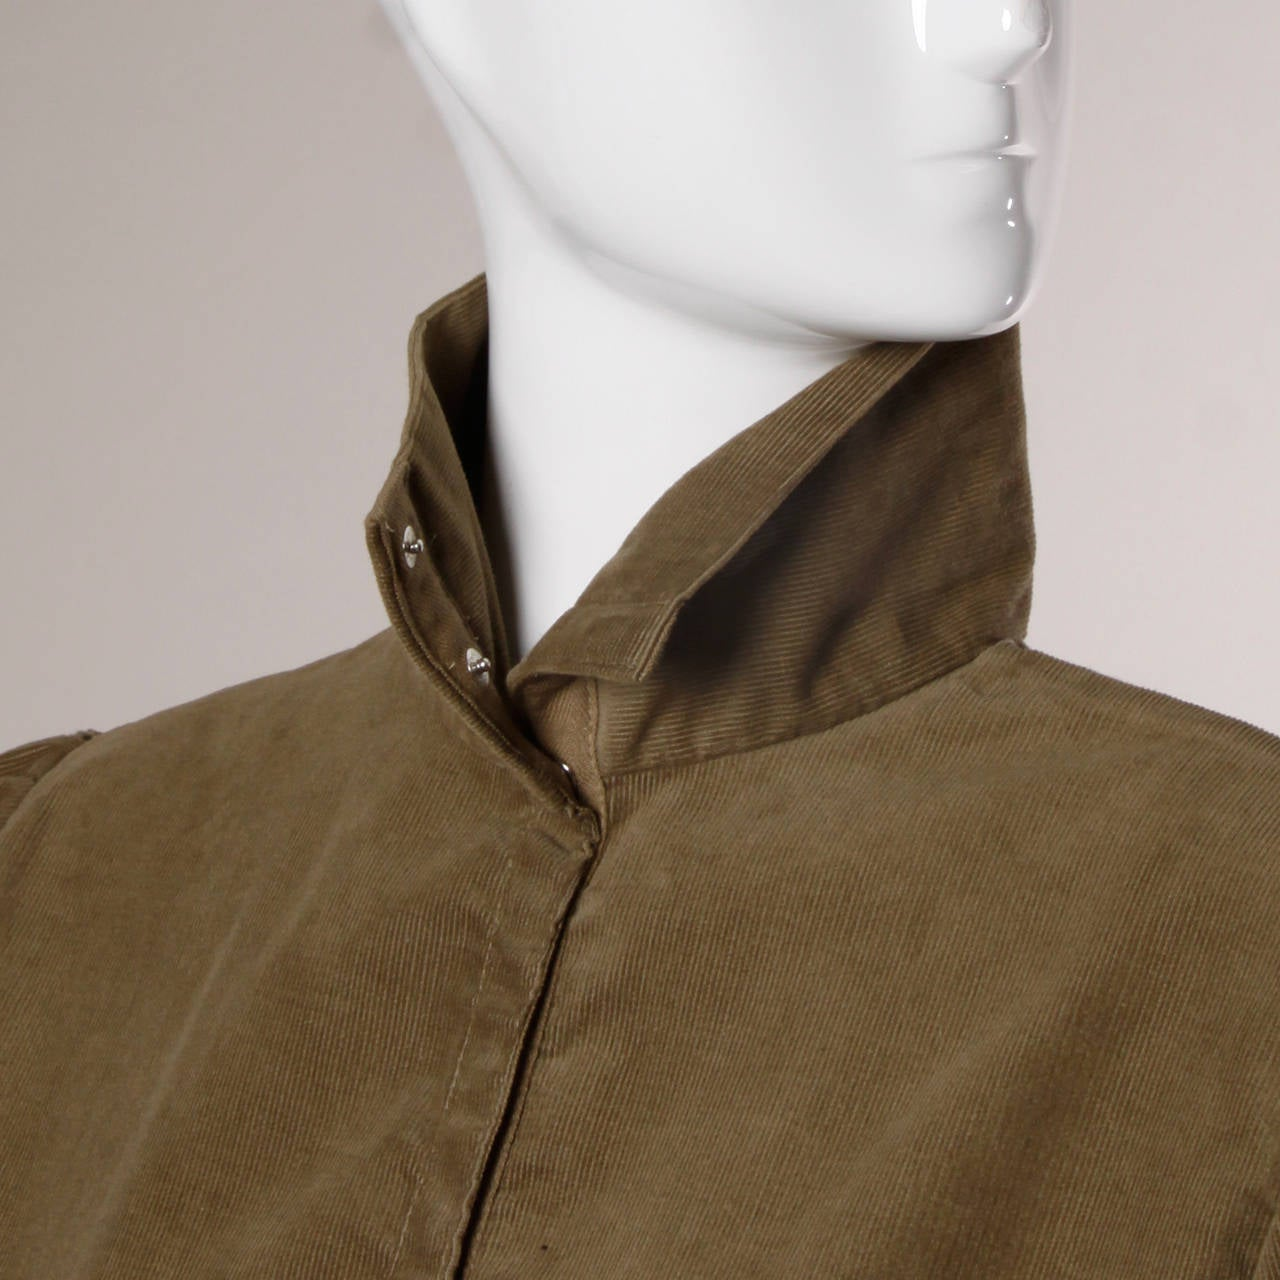 Brown Norma Kamali Vintage Avant Garde Top or Jacket For Sale